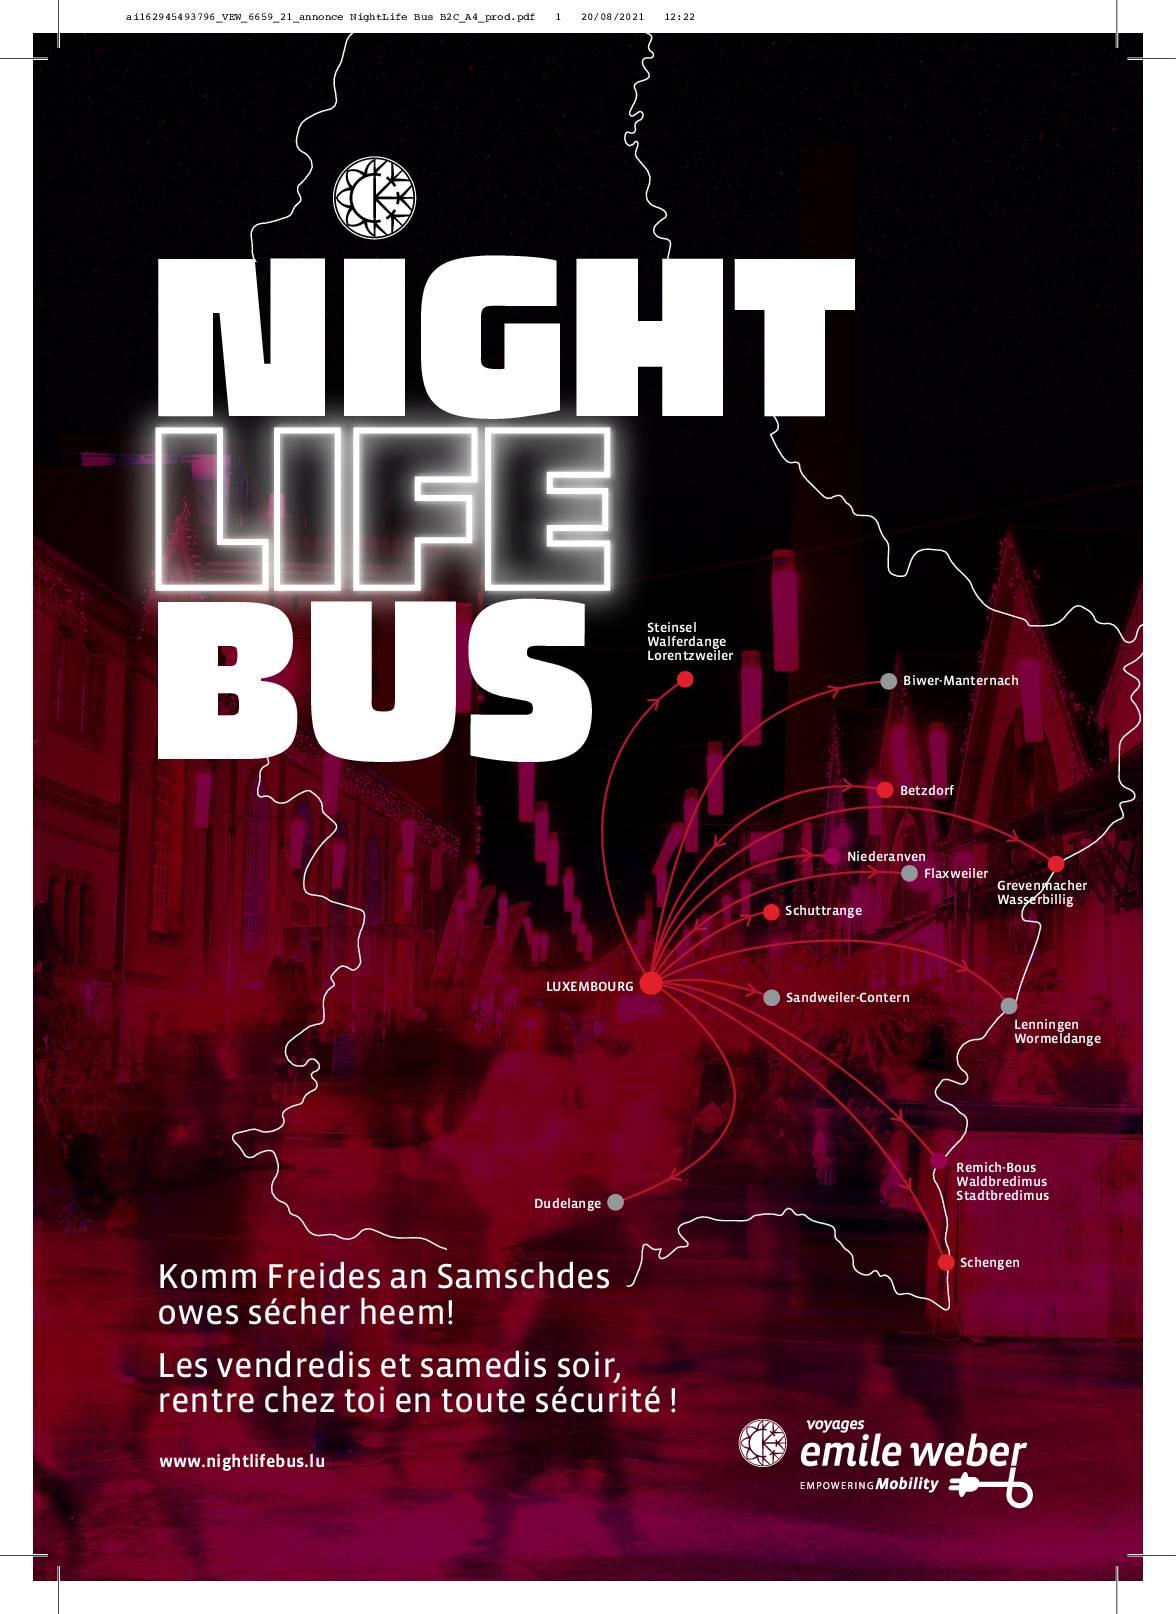 Annonce Nightlifebus B2C - vendredis+samedis - prod